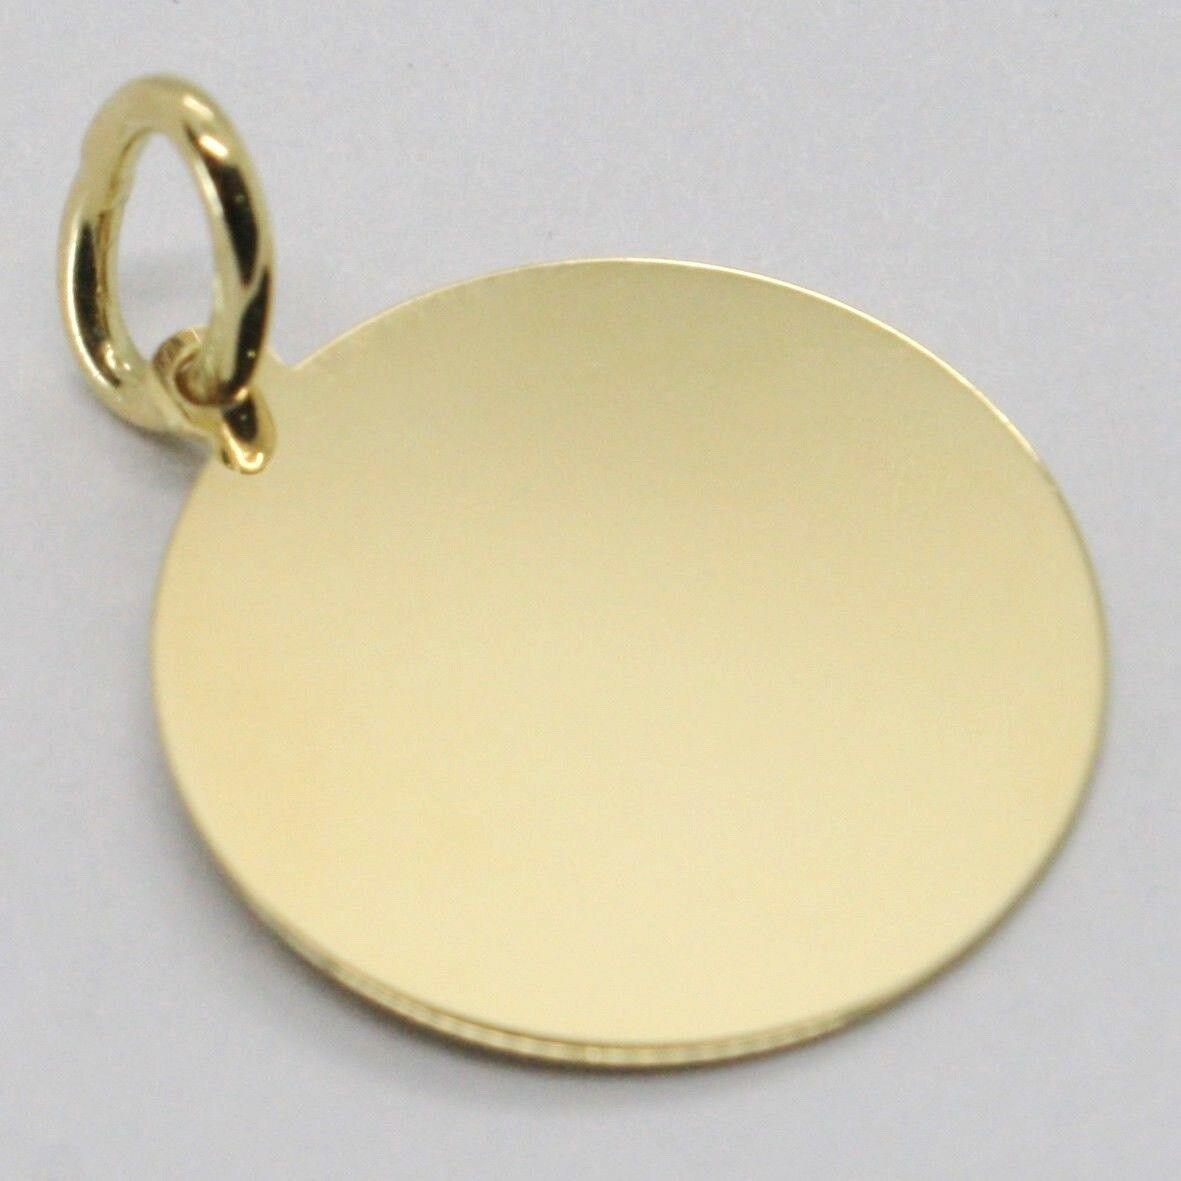 Yellow Gold Pendant 750 18K, Globe Flat, Satin, 16 mm, Italy Made image 4